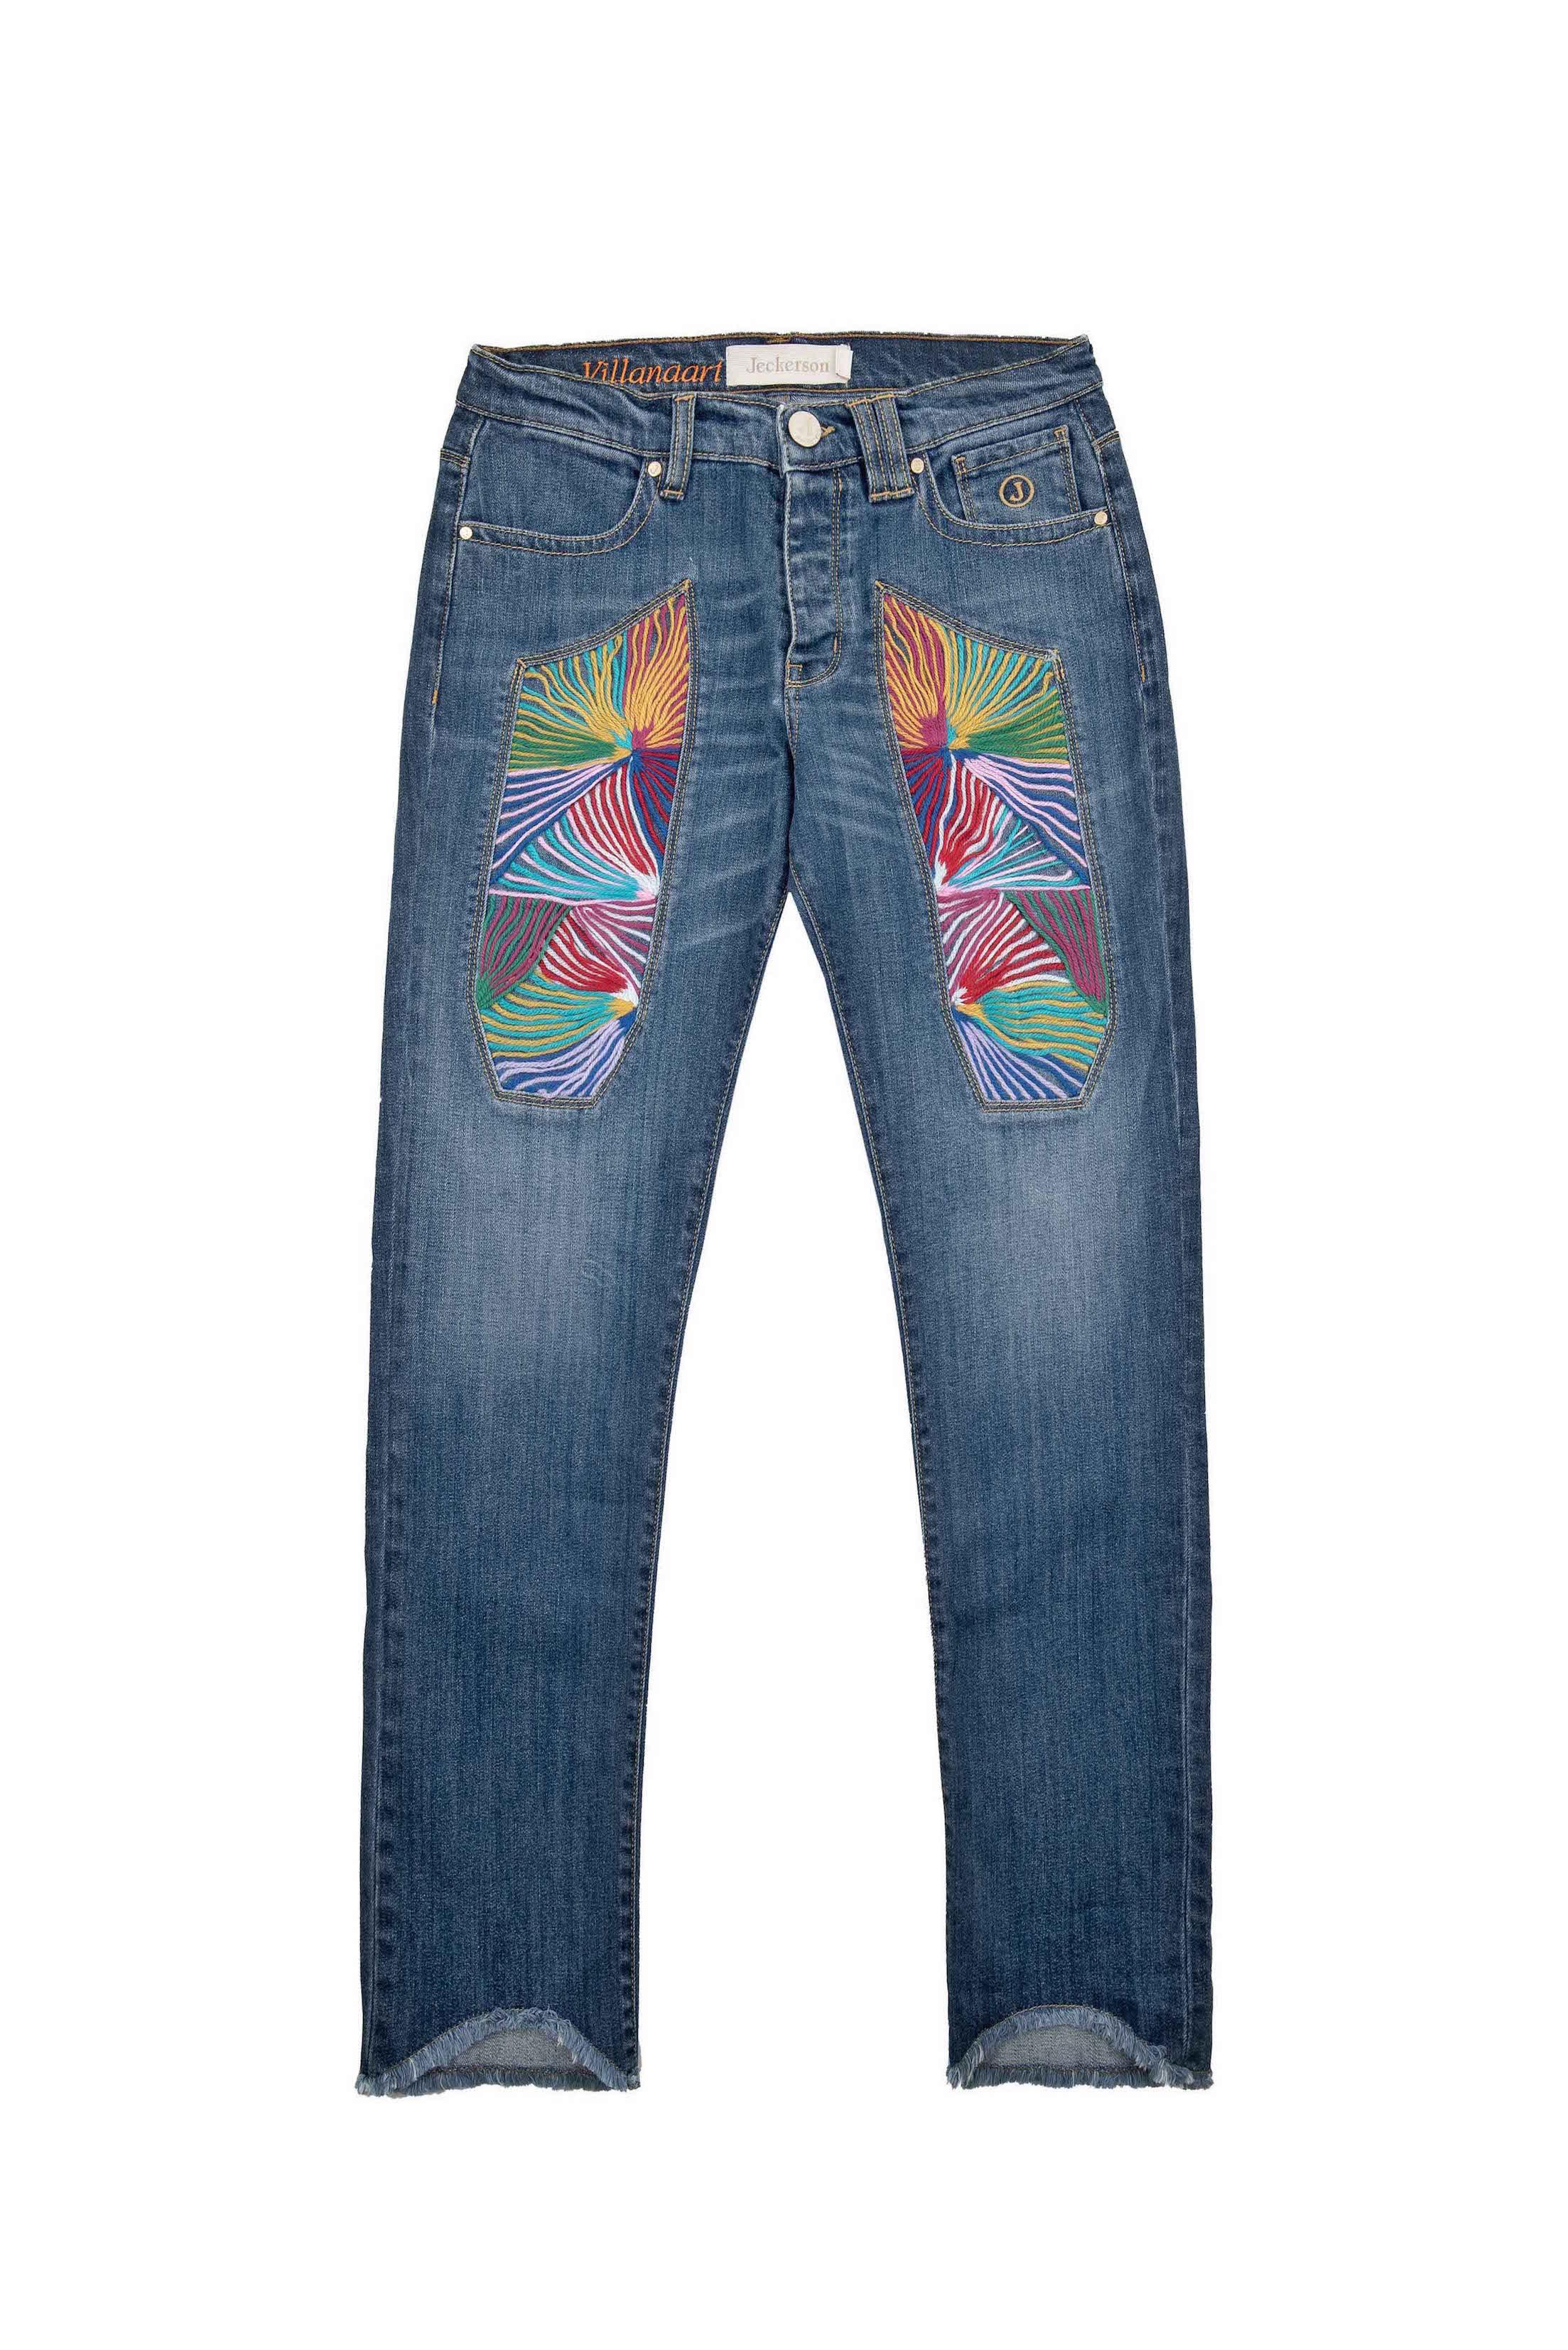 jeckerson pantalone donna